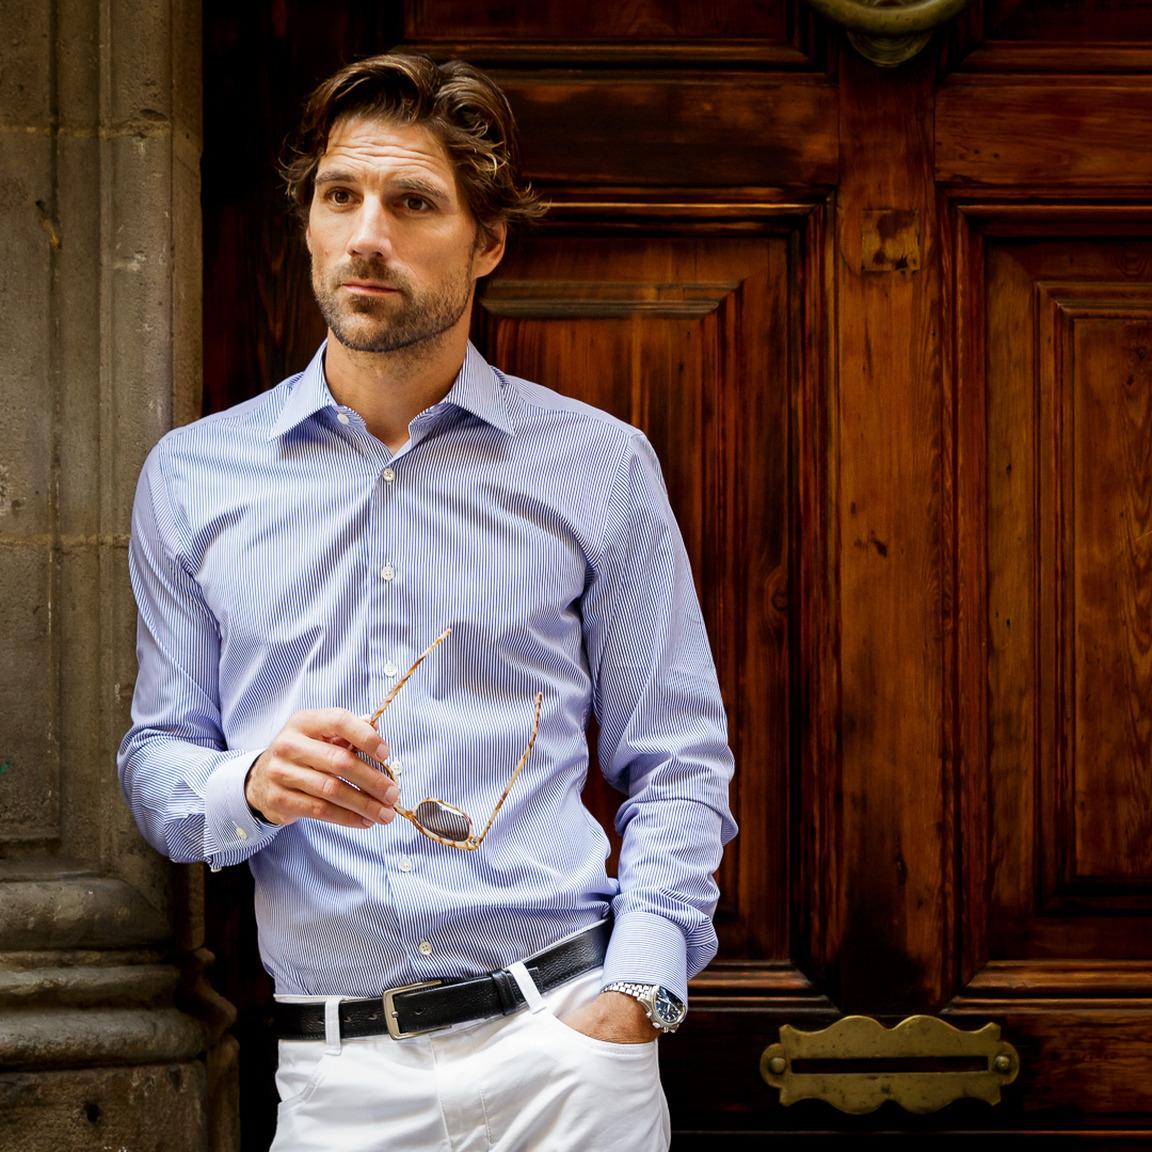 Blue/White striped poplin business shirt